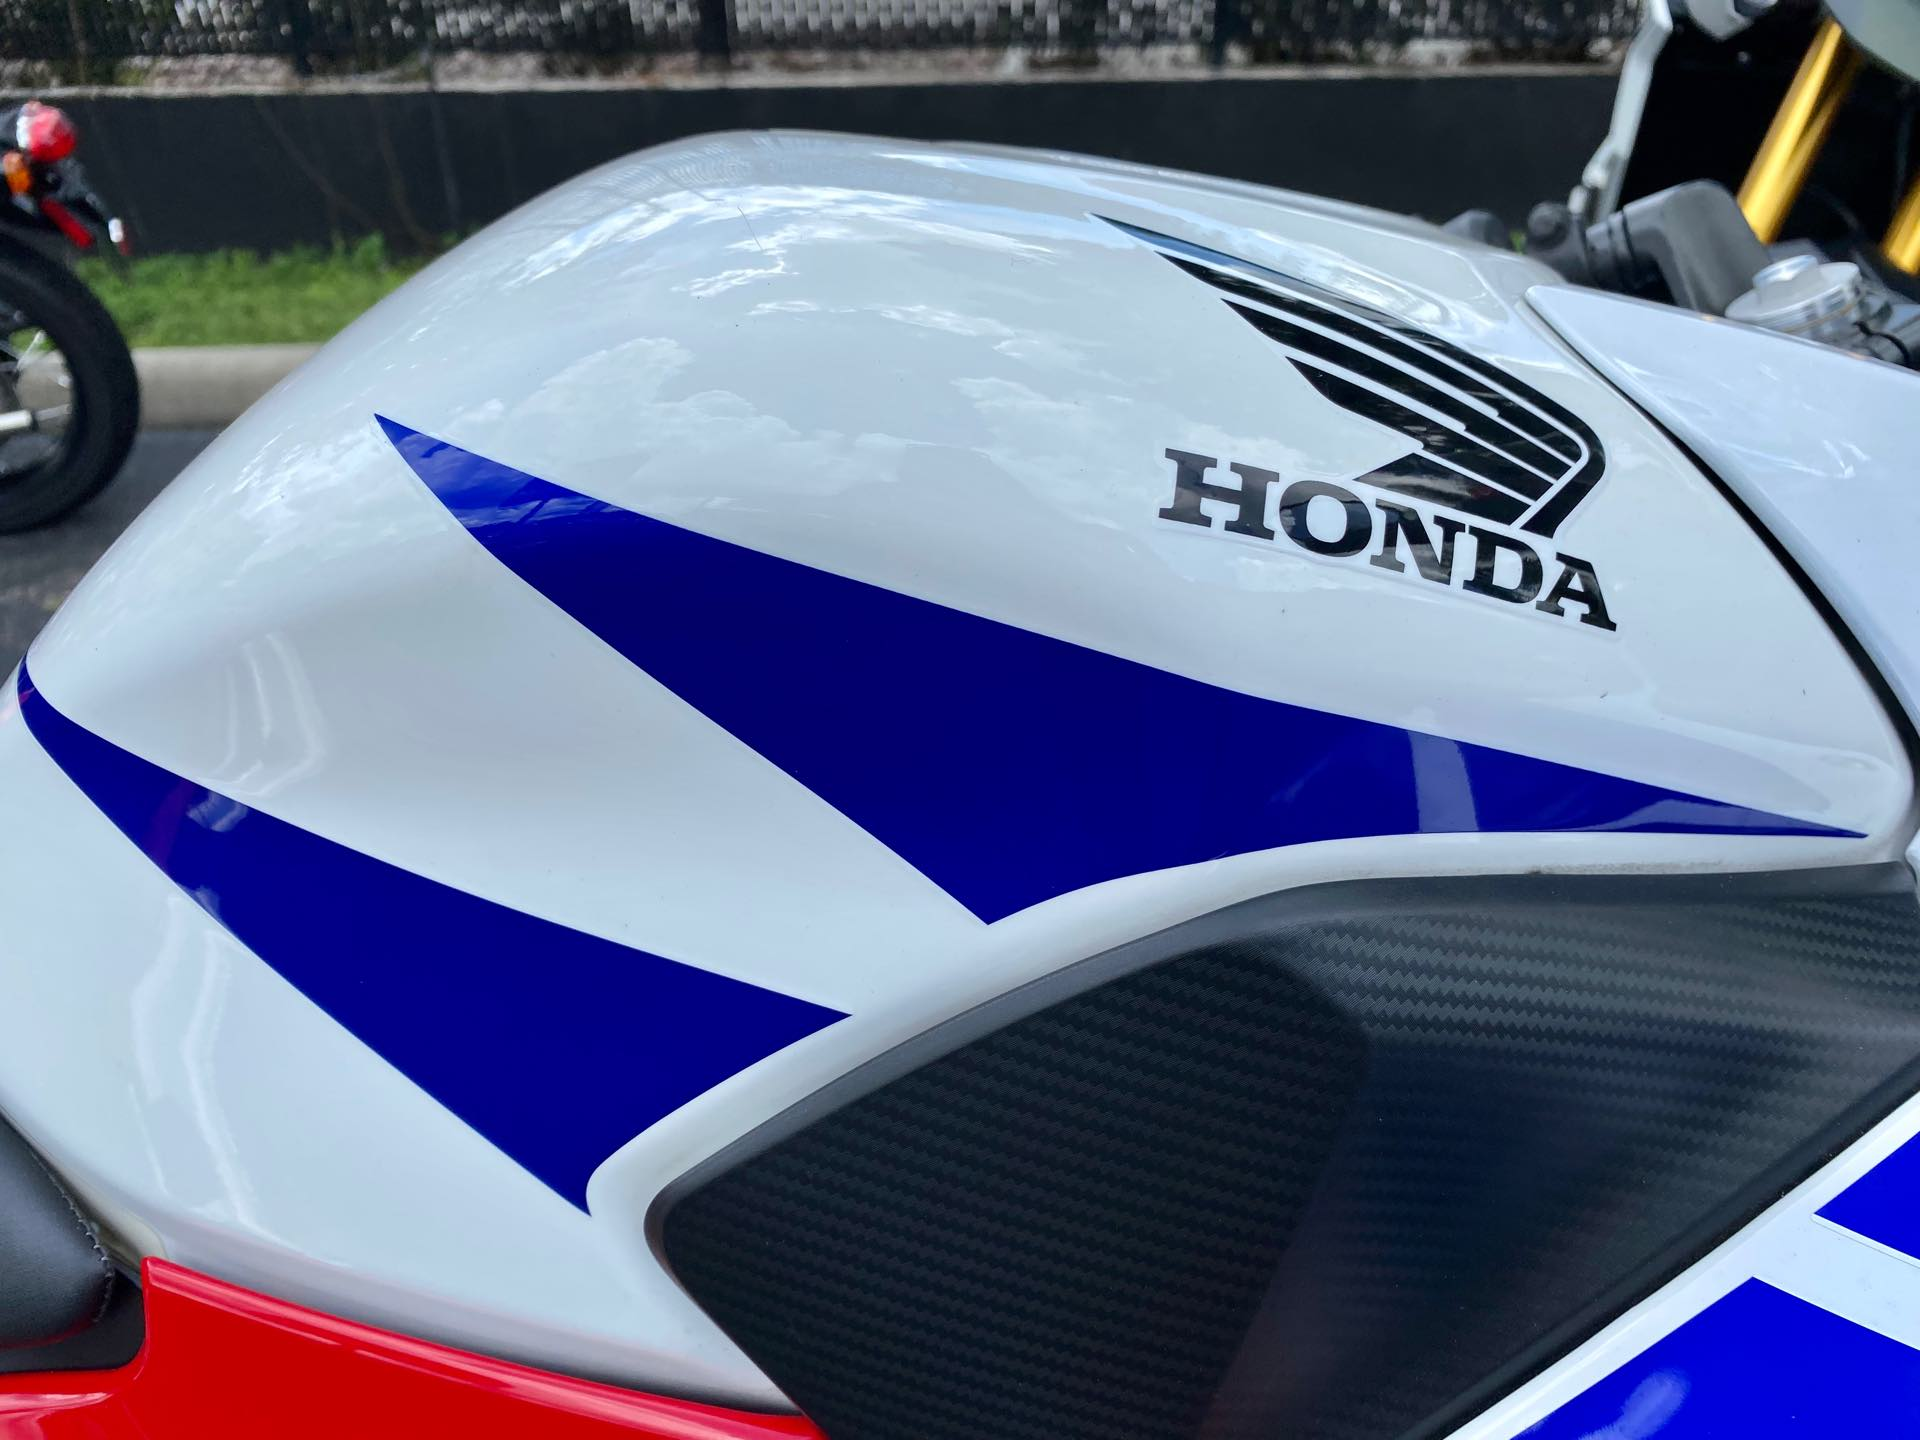 2015 Honda CBR 300R at Tampa Triumph, Tampa, FL 33614